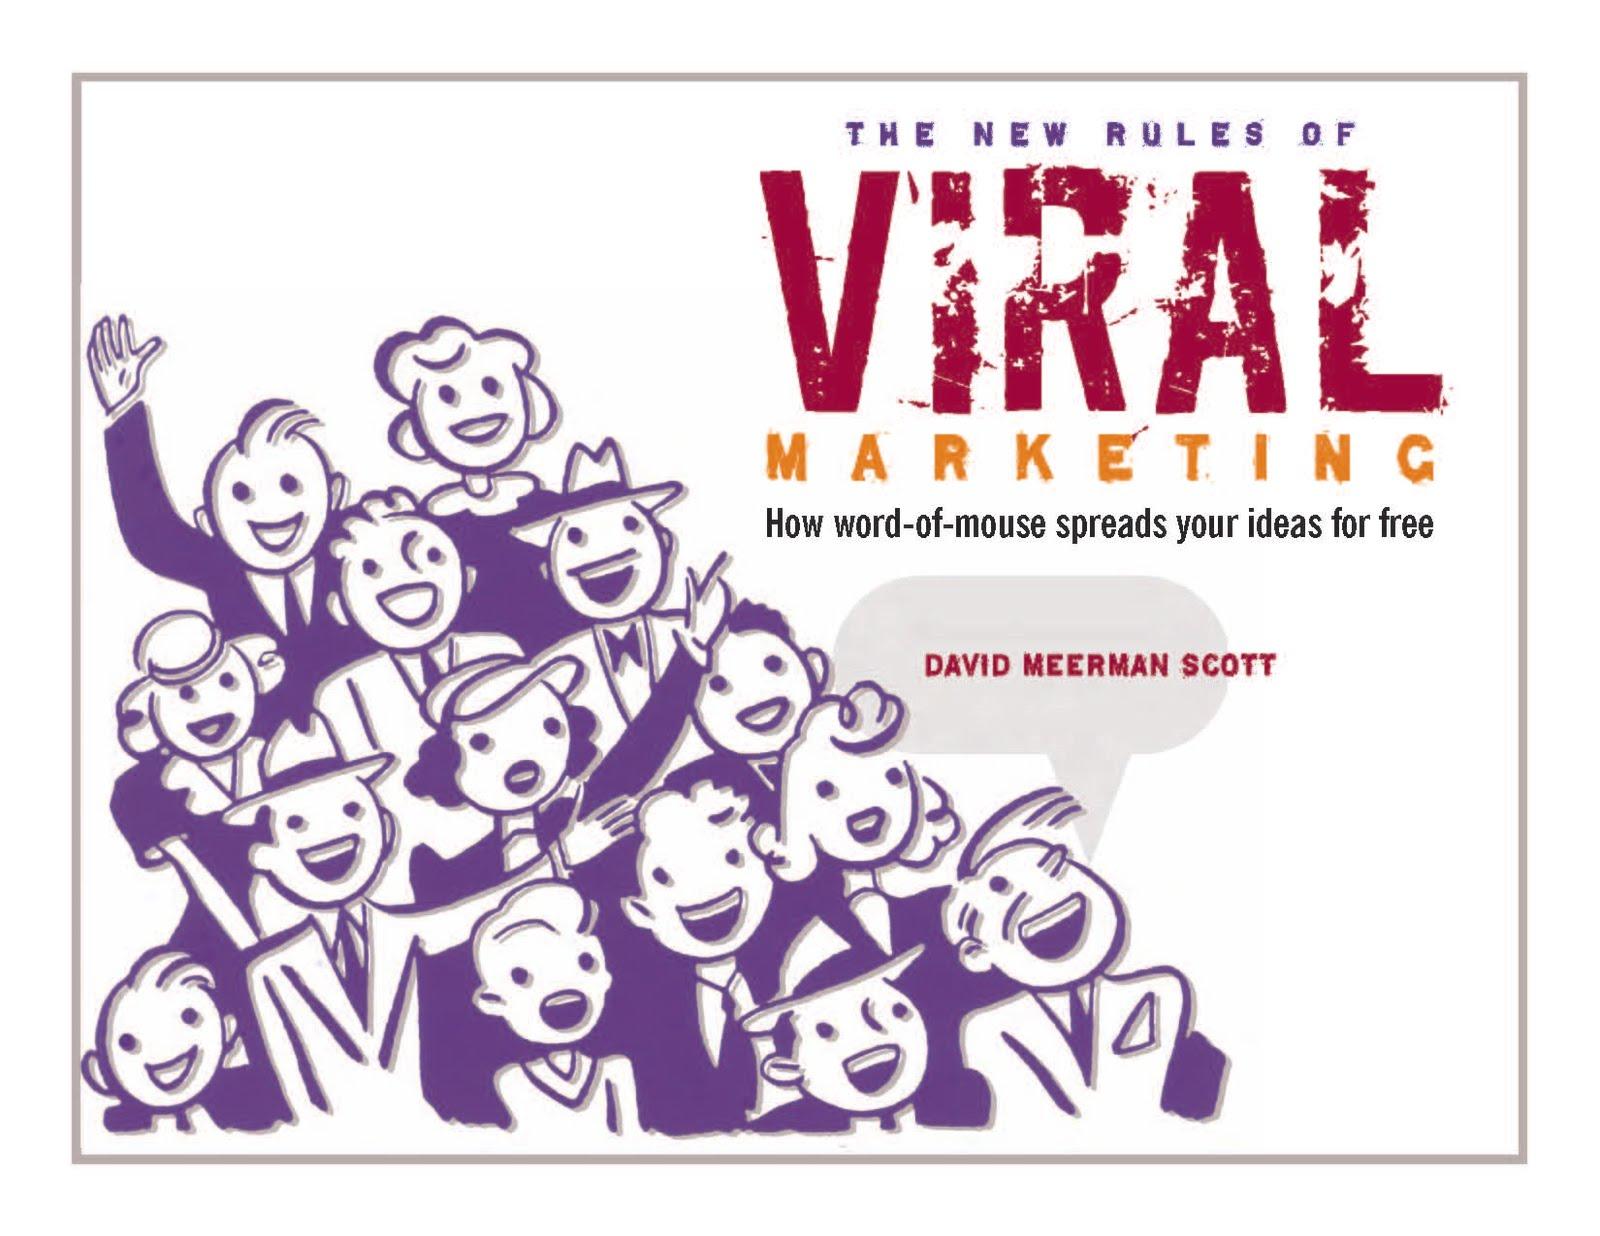 Marketing knowledge and skills